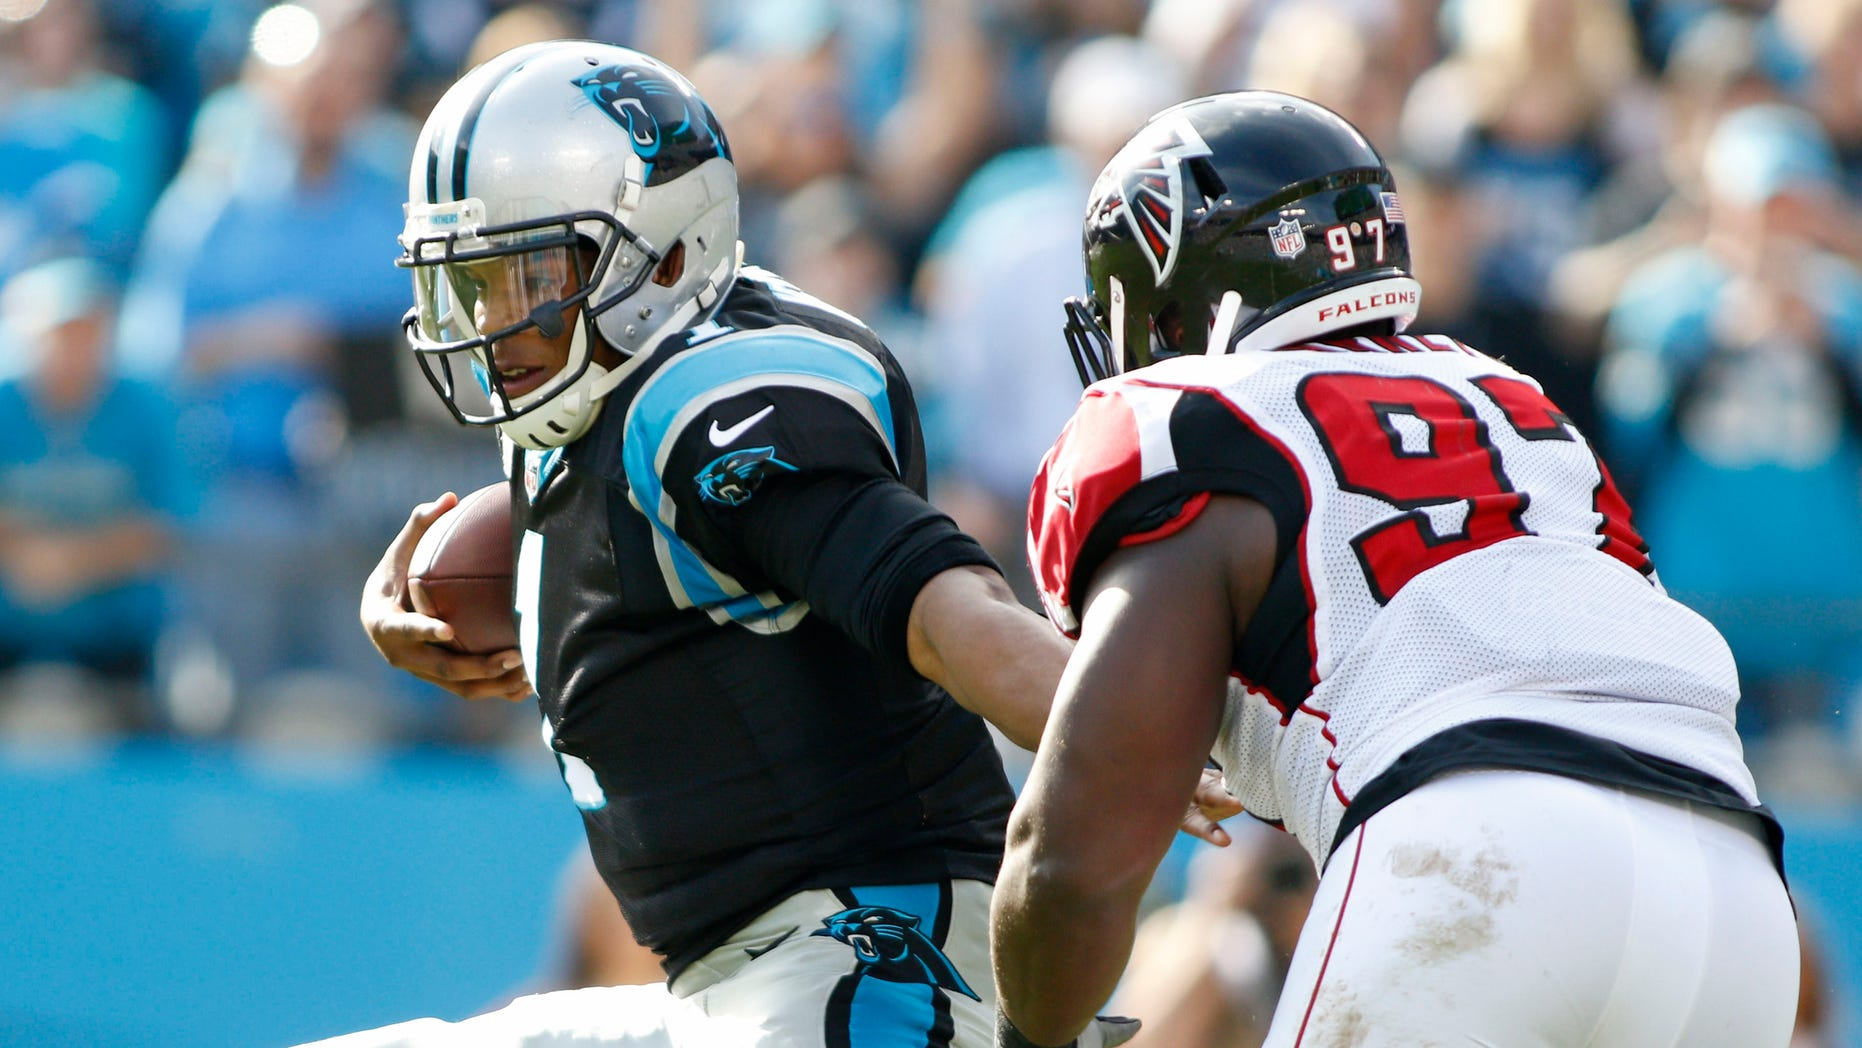 Carolina Panthers' Cam Newton (1) breaks away from Atlanta Falcons' Grady Jarrett (97) in the first half of an NFL football game in Charlotte, N.C., Sunday, Dec. 13, 2015. (AP Photo/Bob Leverone)